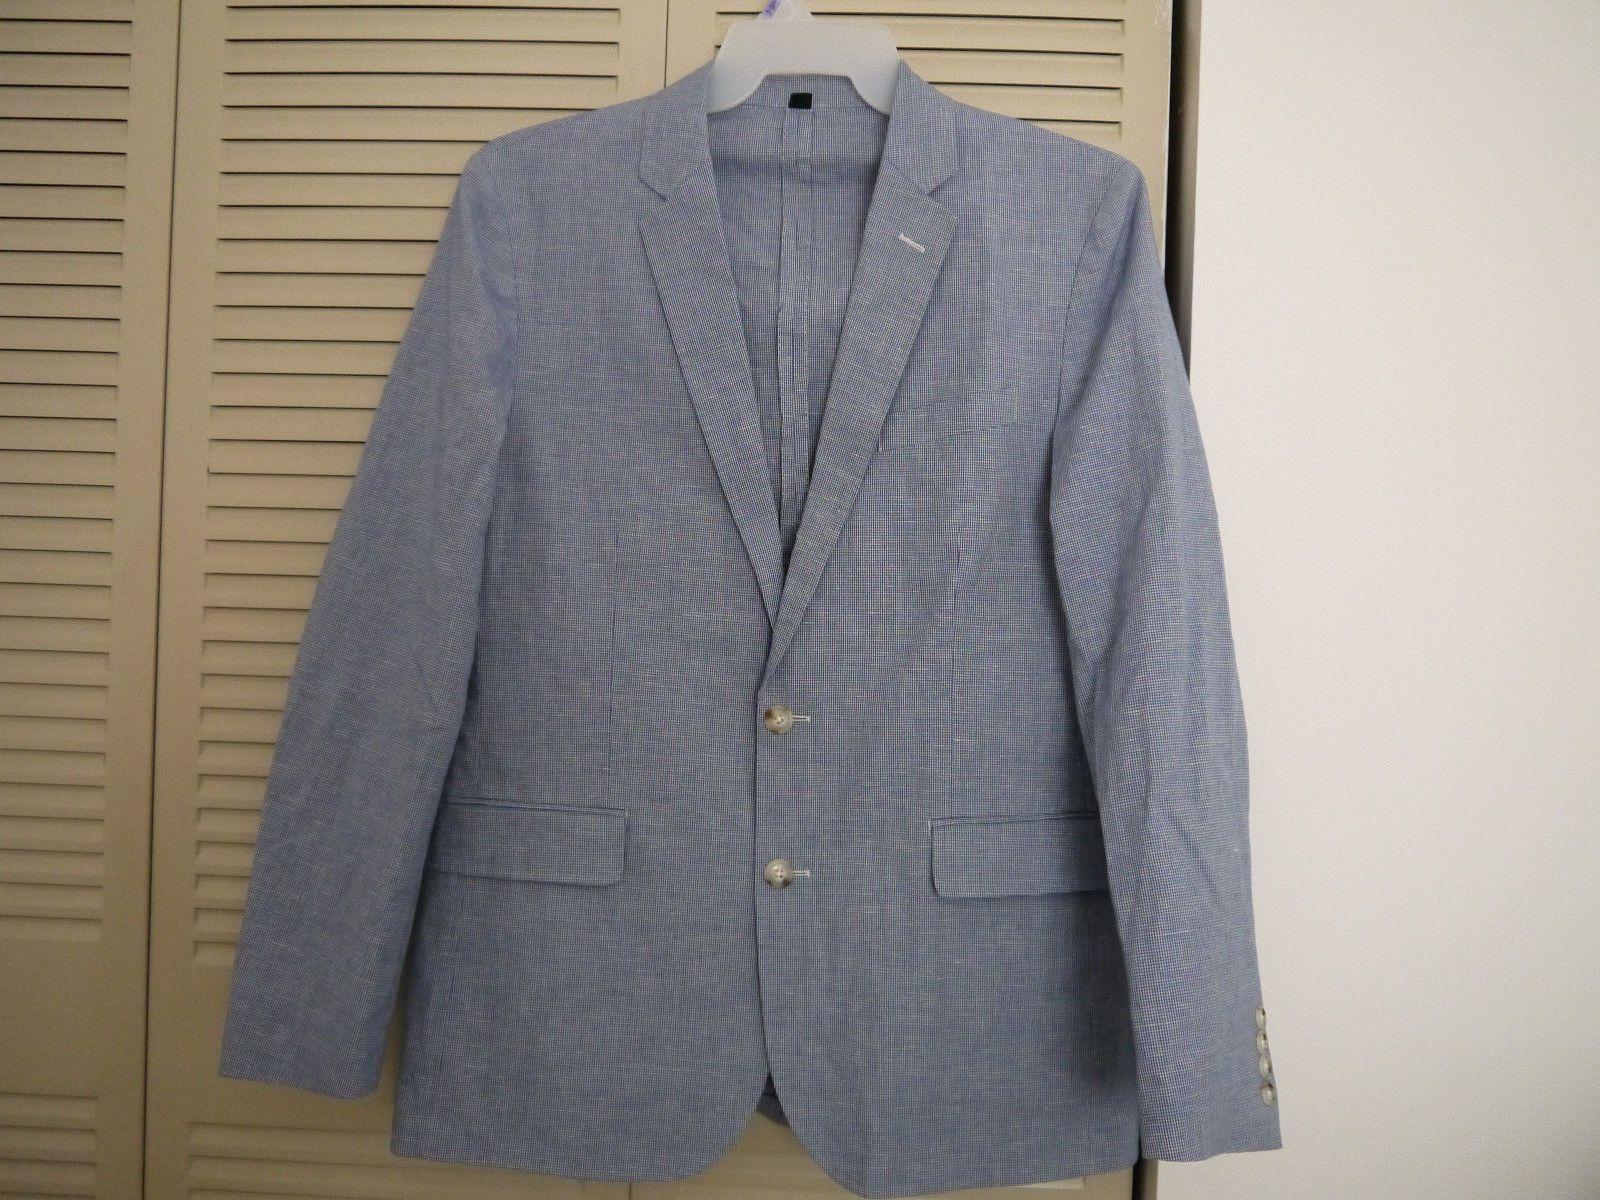 d27dfe19c645 J.Crew Unstructured Ludlow Slim-fit cotton-linen blazer in blue houndstooth  40R